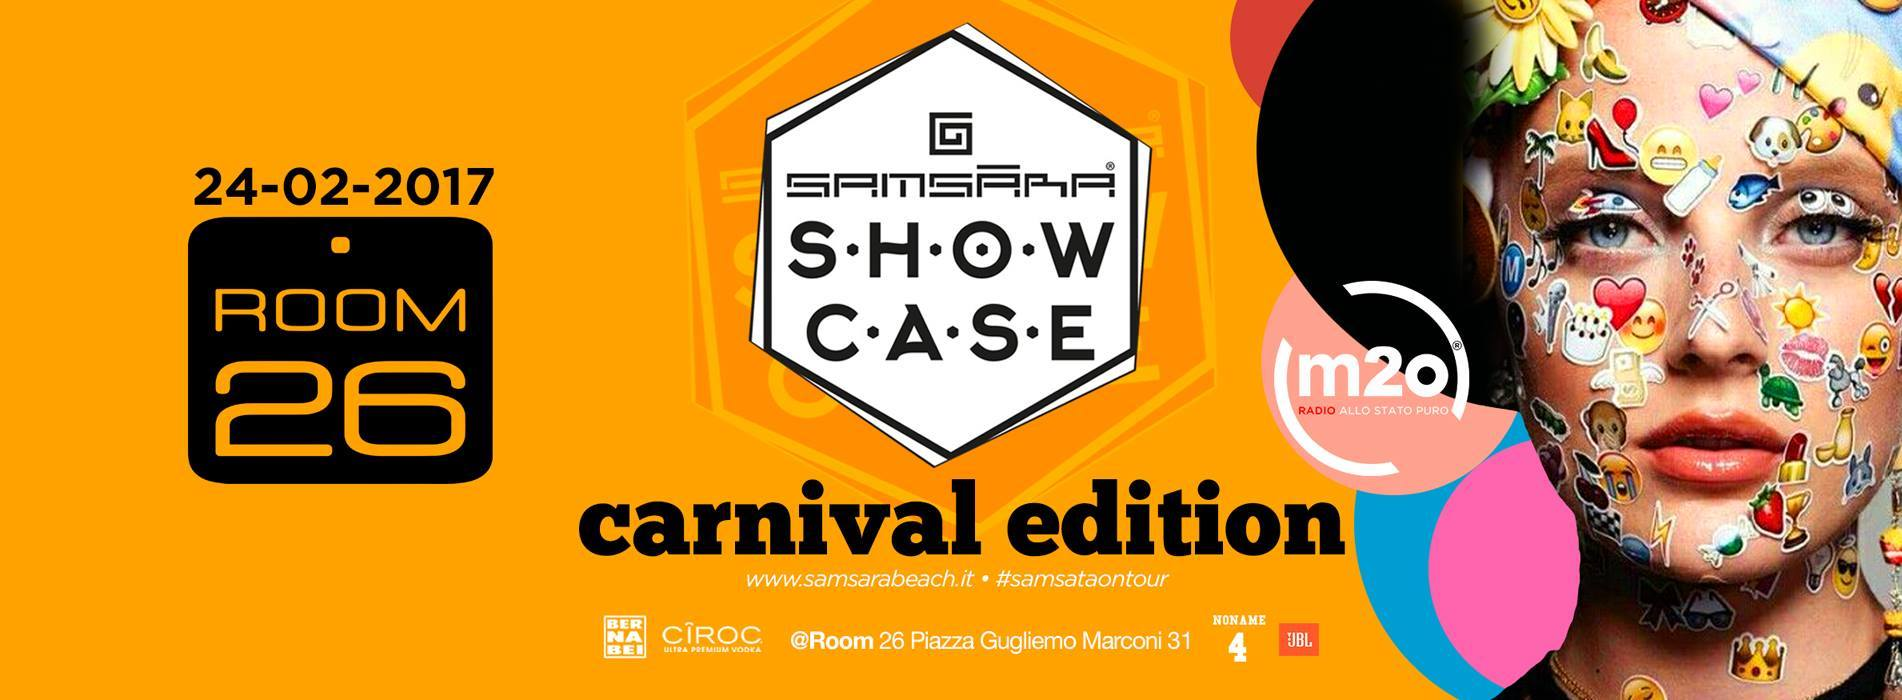 Samsara carnival edition Room 26 venerdì 24 febbraio discoteche Roma